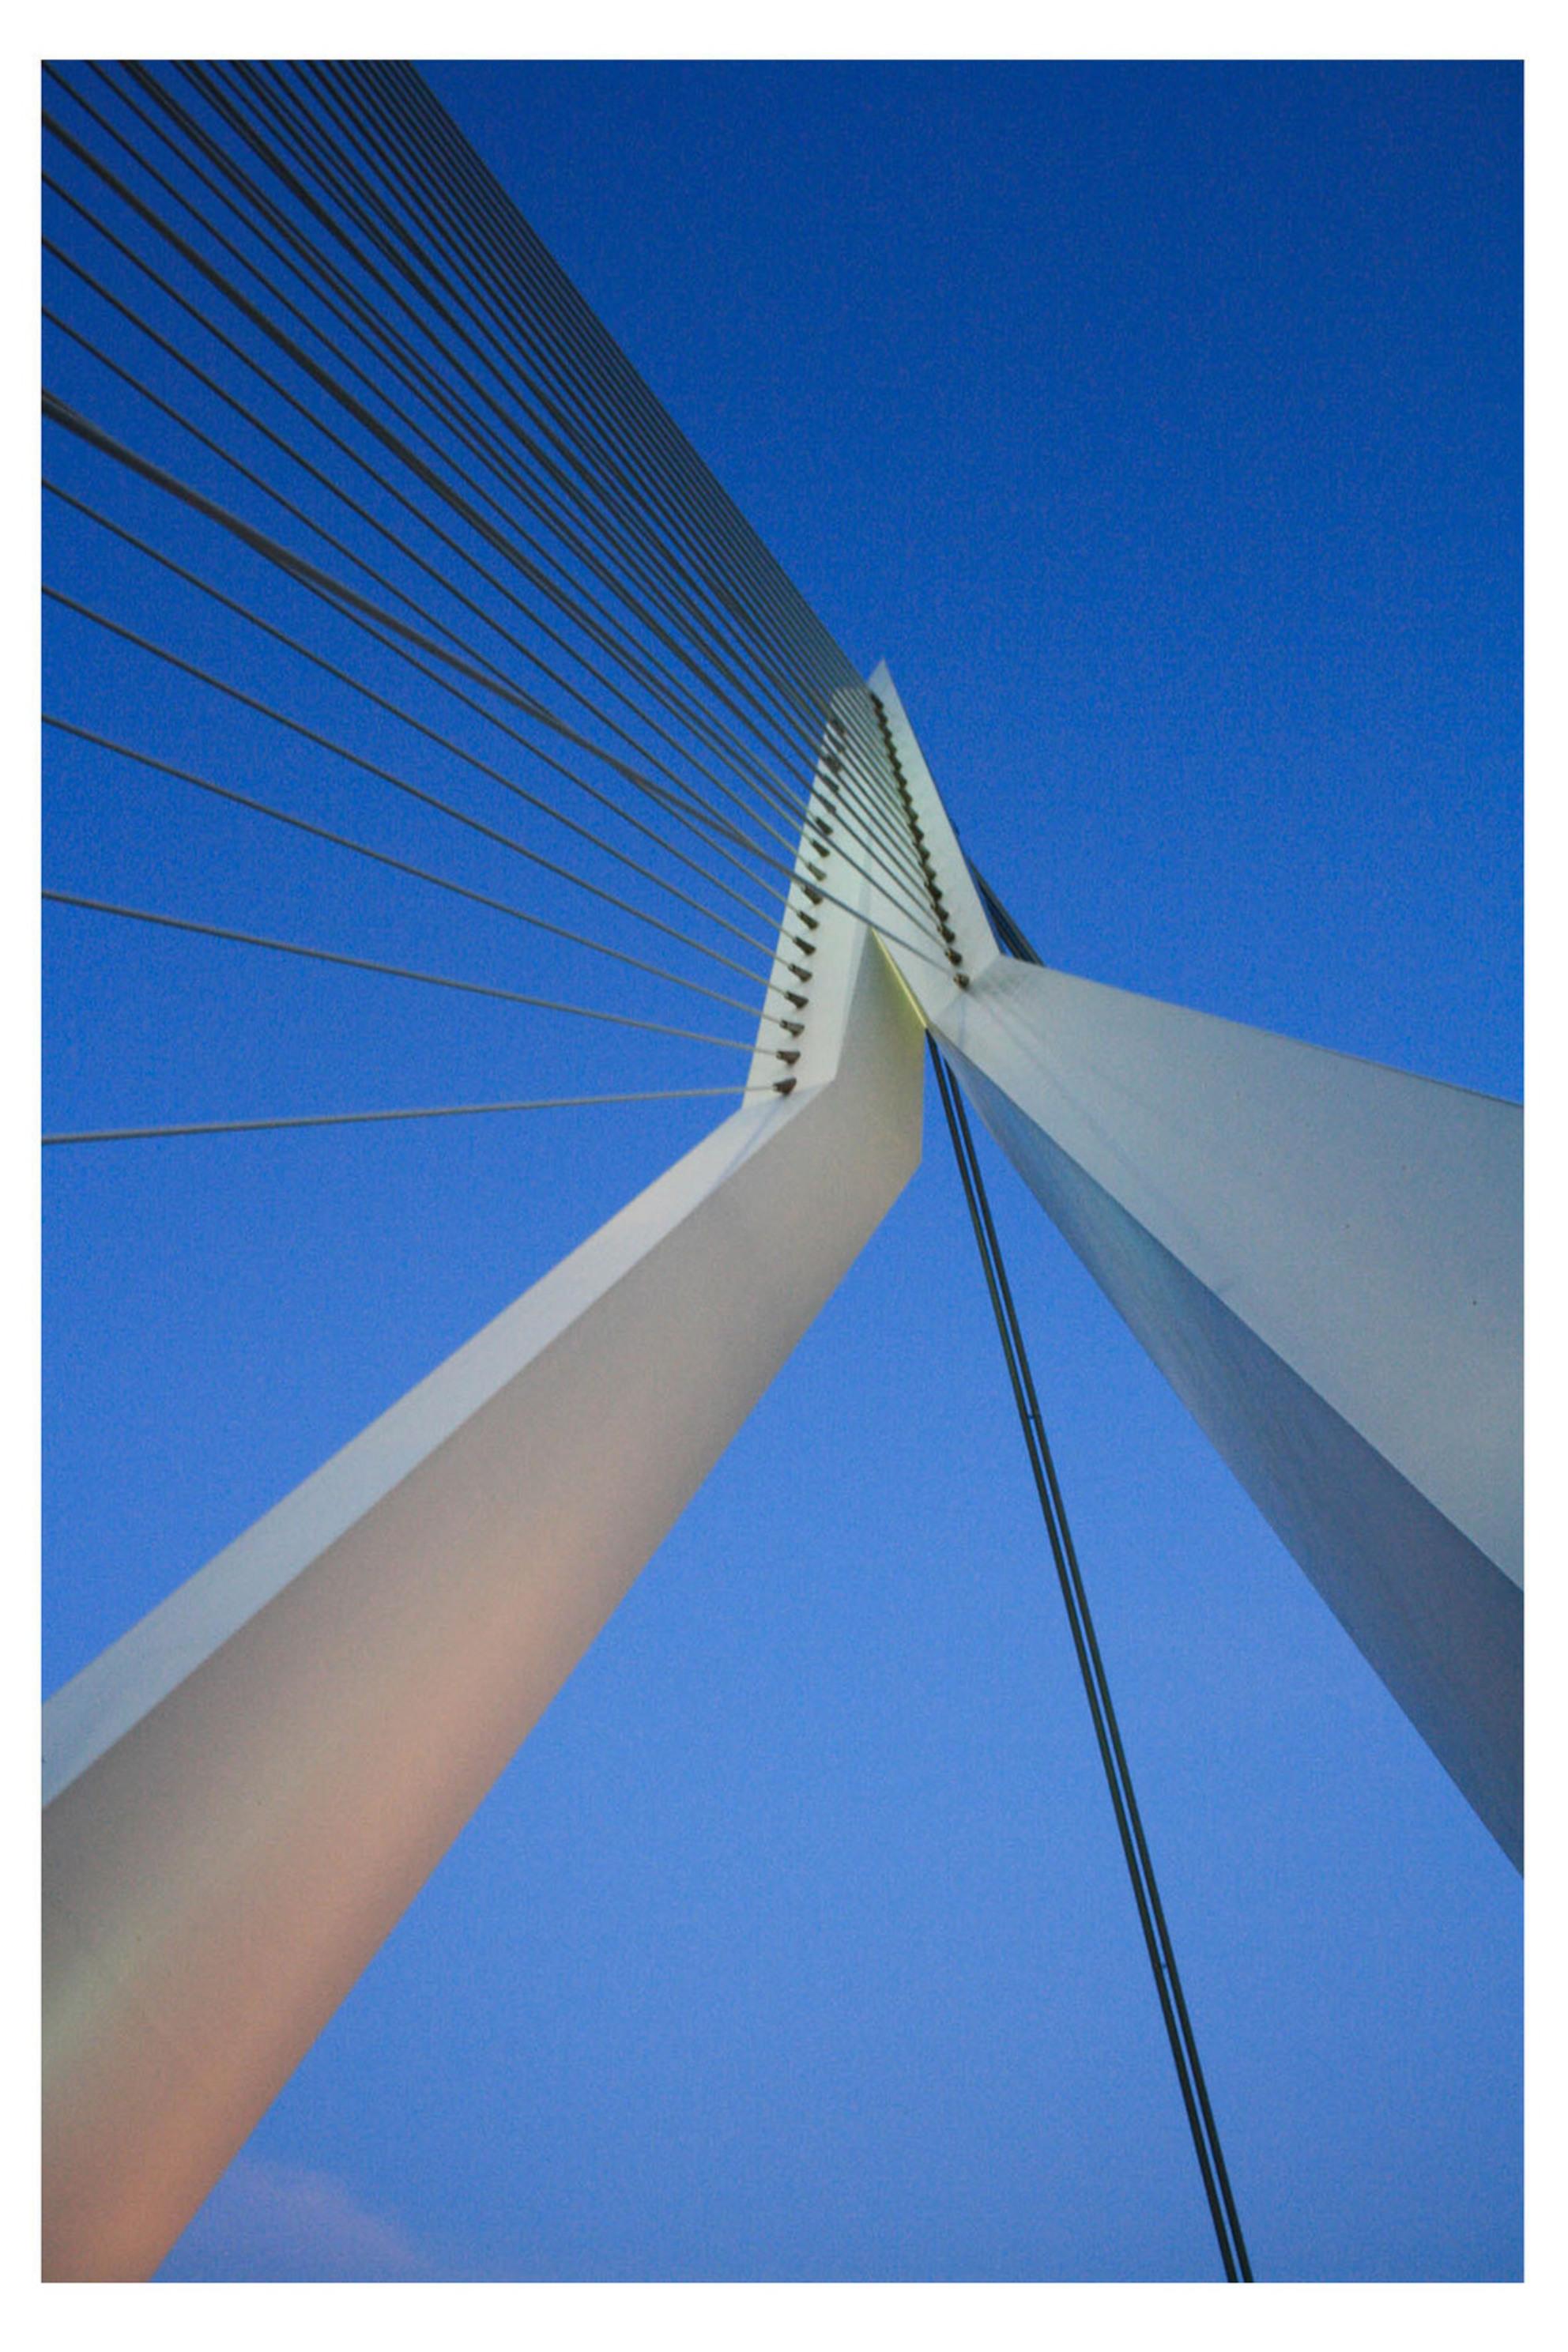 Rotterdamse lijnen - Erasmusbrug - foto door anneliefsje op 25-03-2011 - deze foto bevat: rotterdam, erasmusbrug